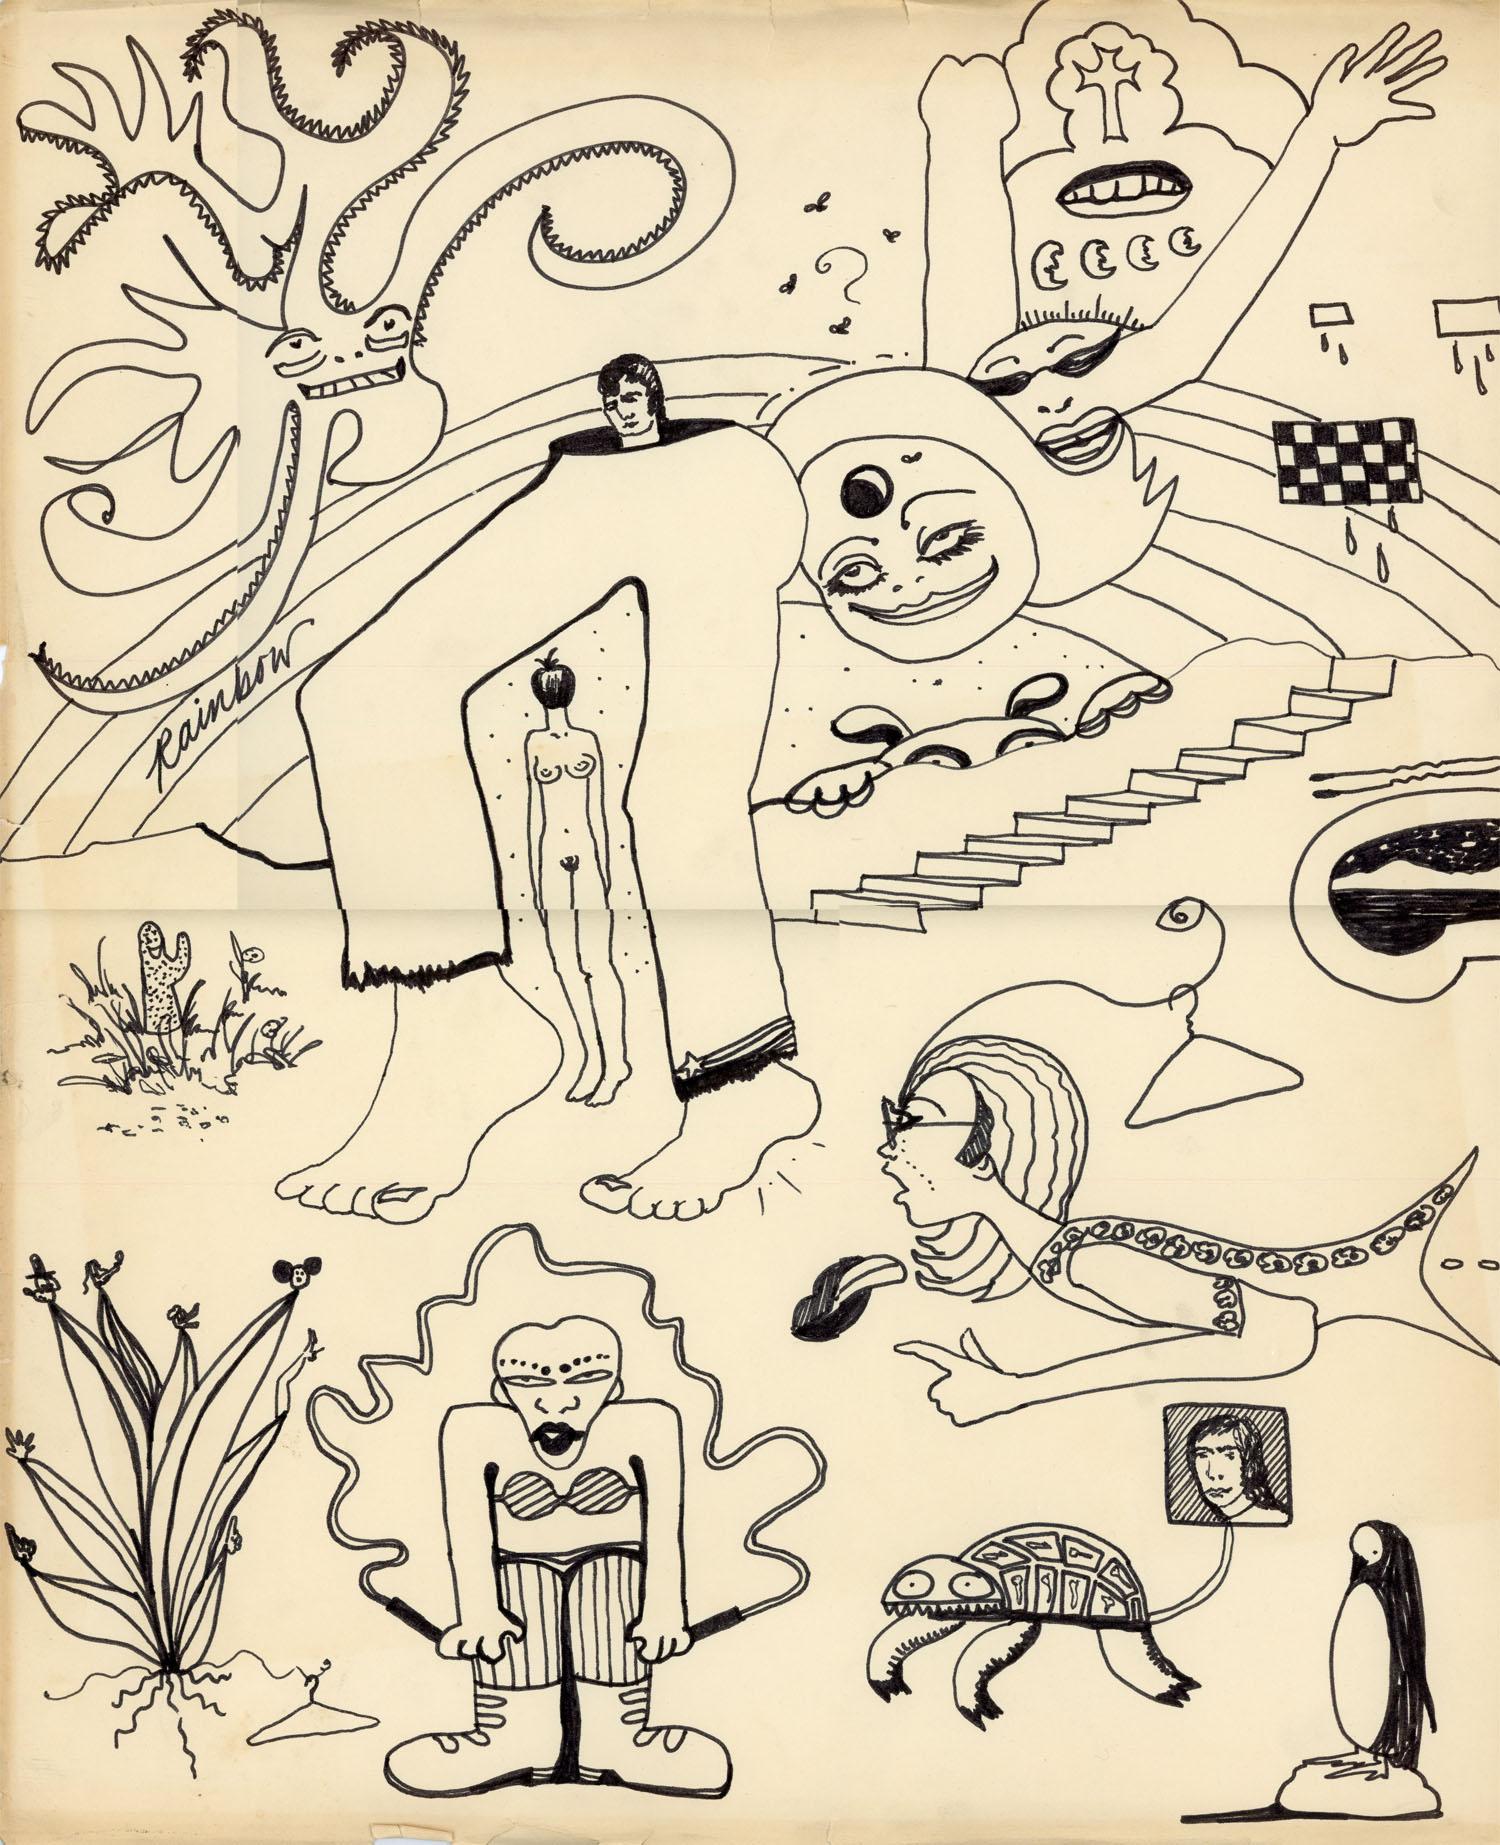 Carla Dee Ellis, Untitled, Ink on paper, c. 1970.